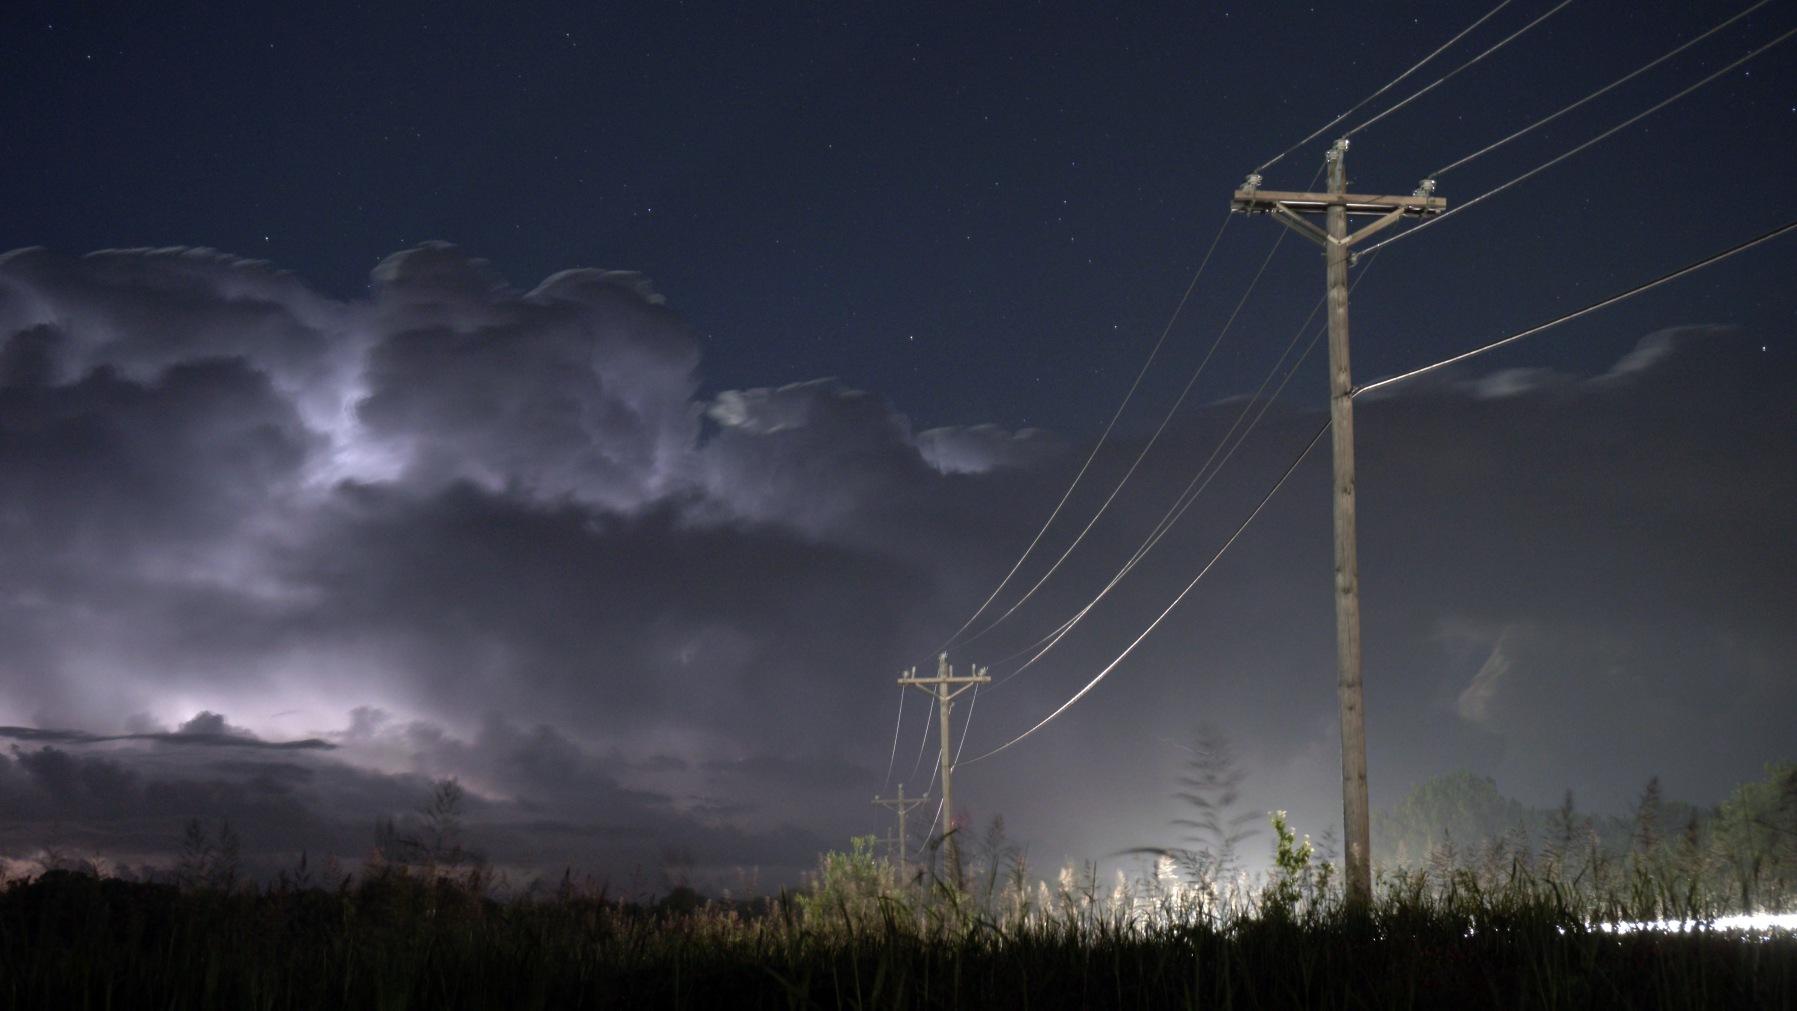 Severe storm below a star filled sky, Hillsboro, Texas.